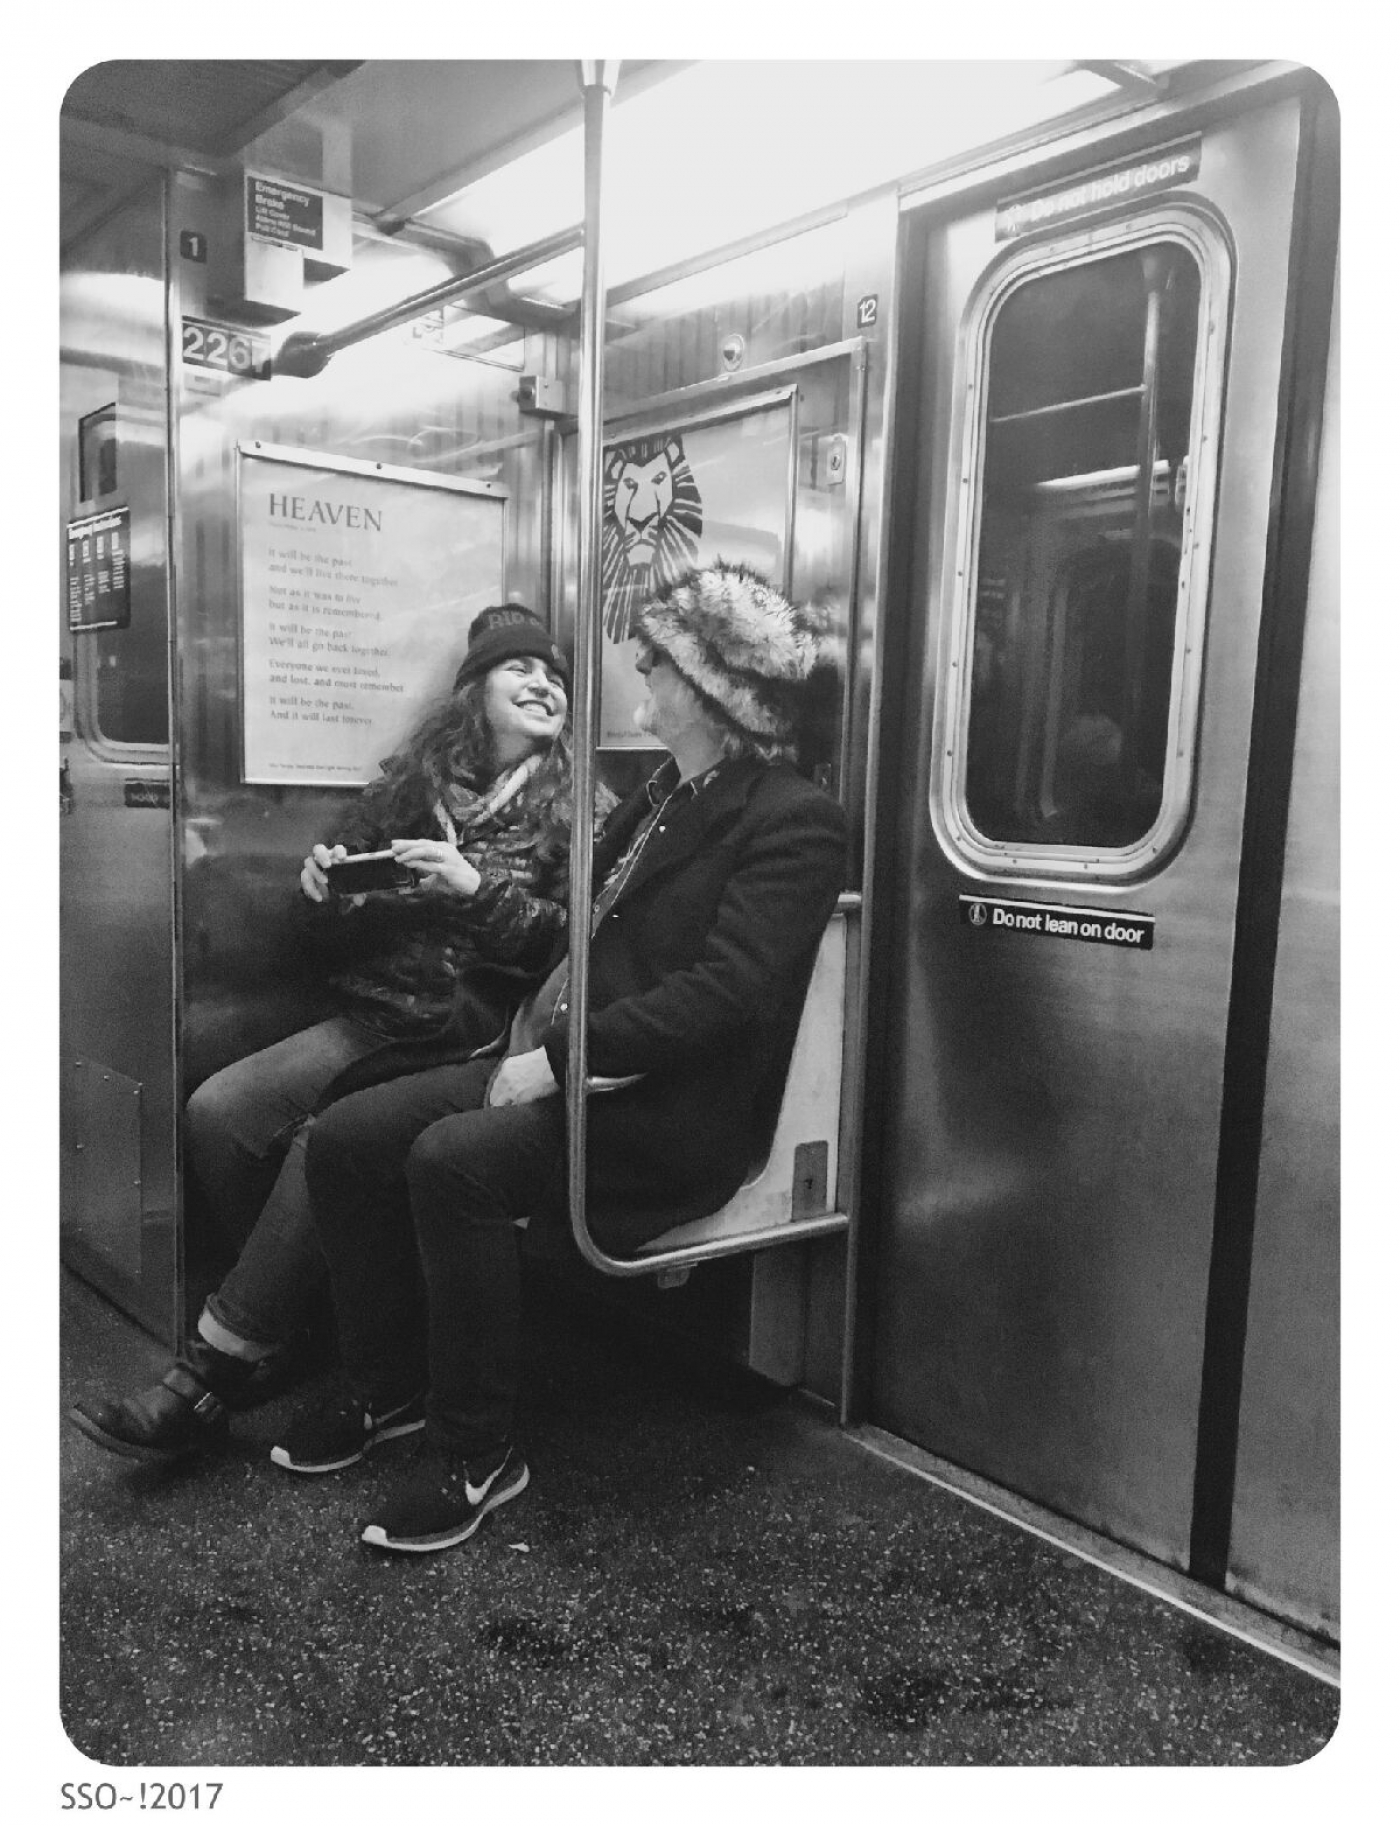 Late night subway, photo by Tammy Shine